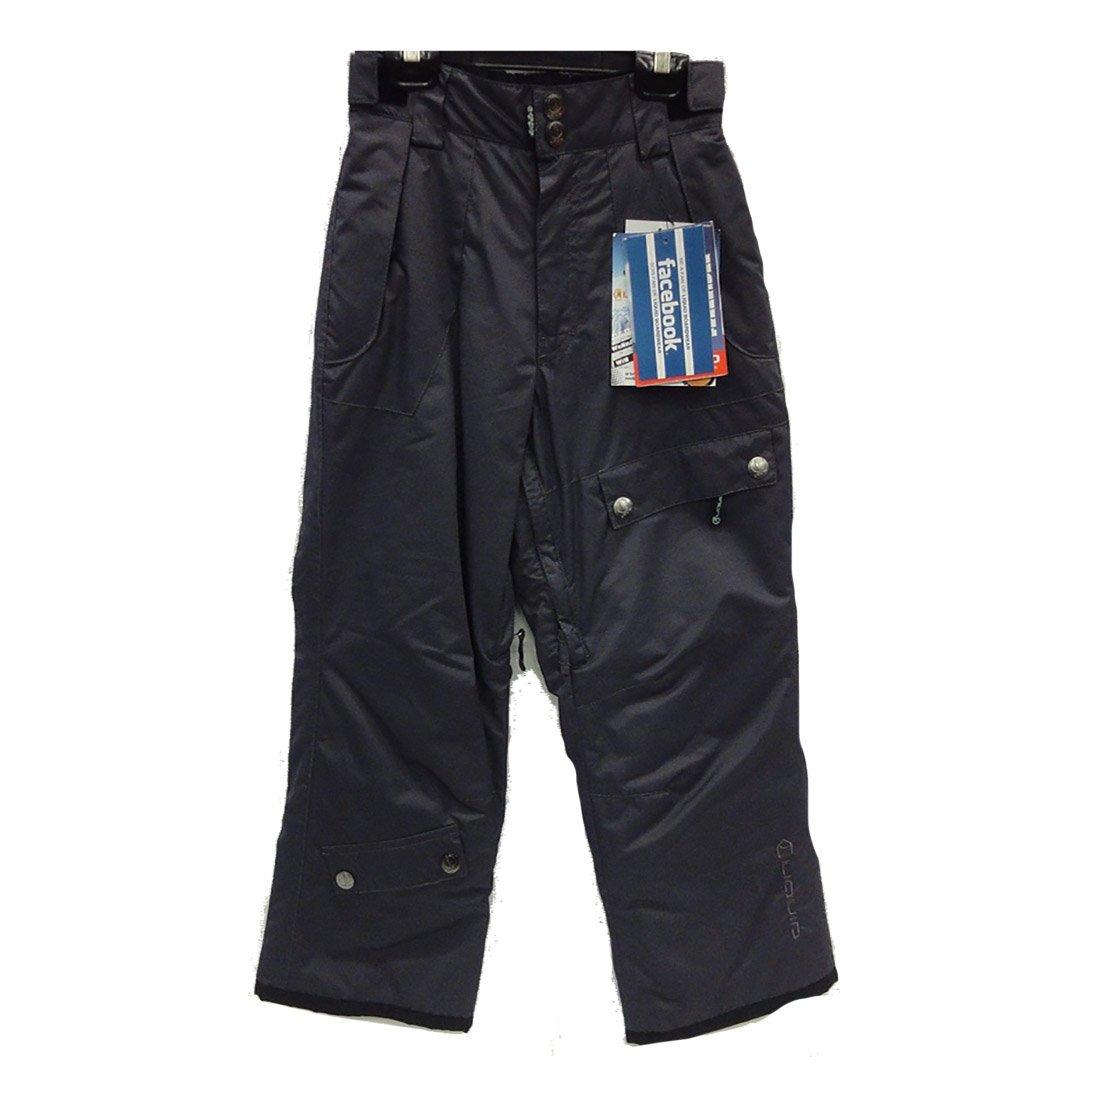 Liquid Boardwear Boys Shermy Pant Size Small Charcoal by Liquid Boardwear